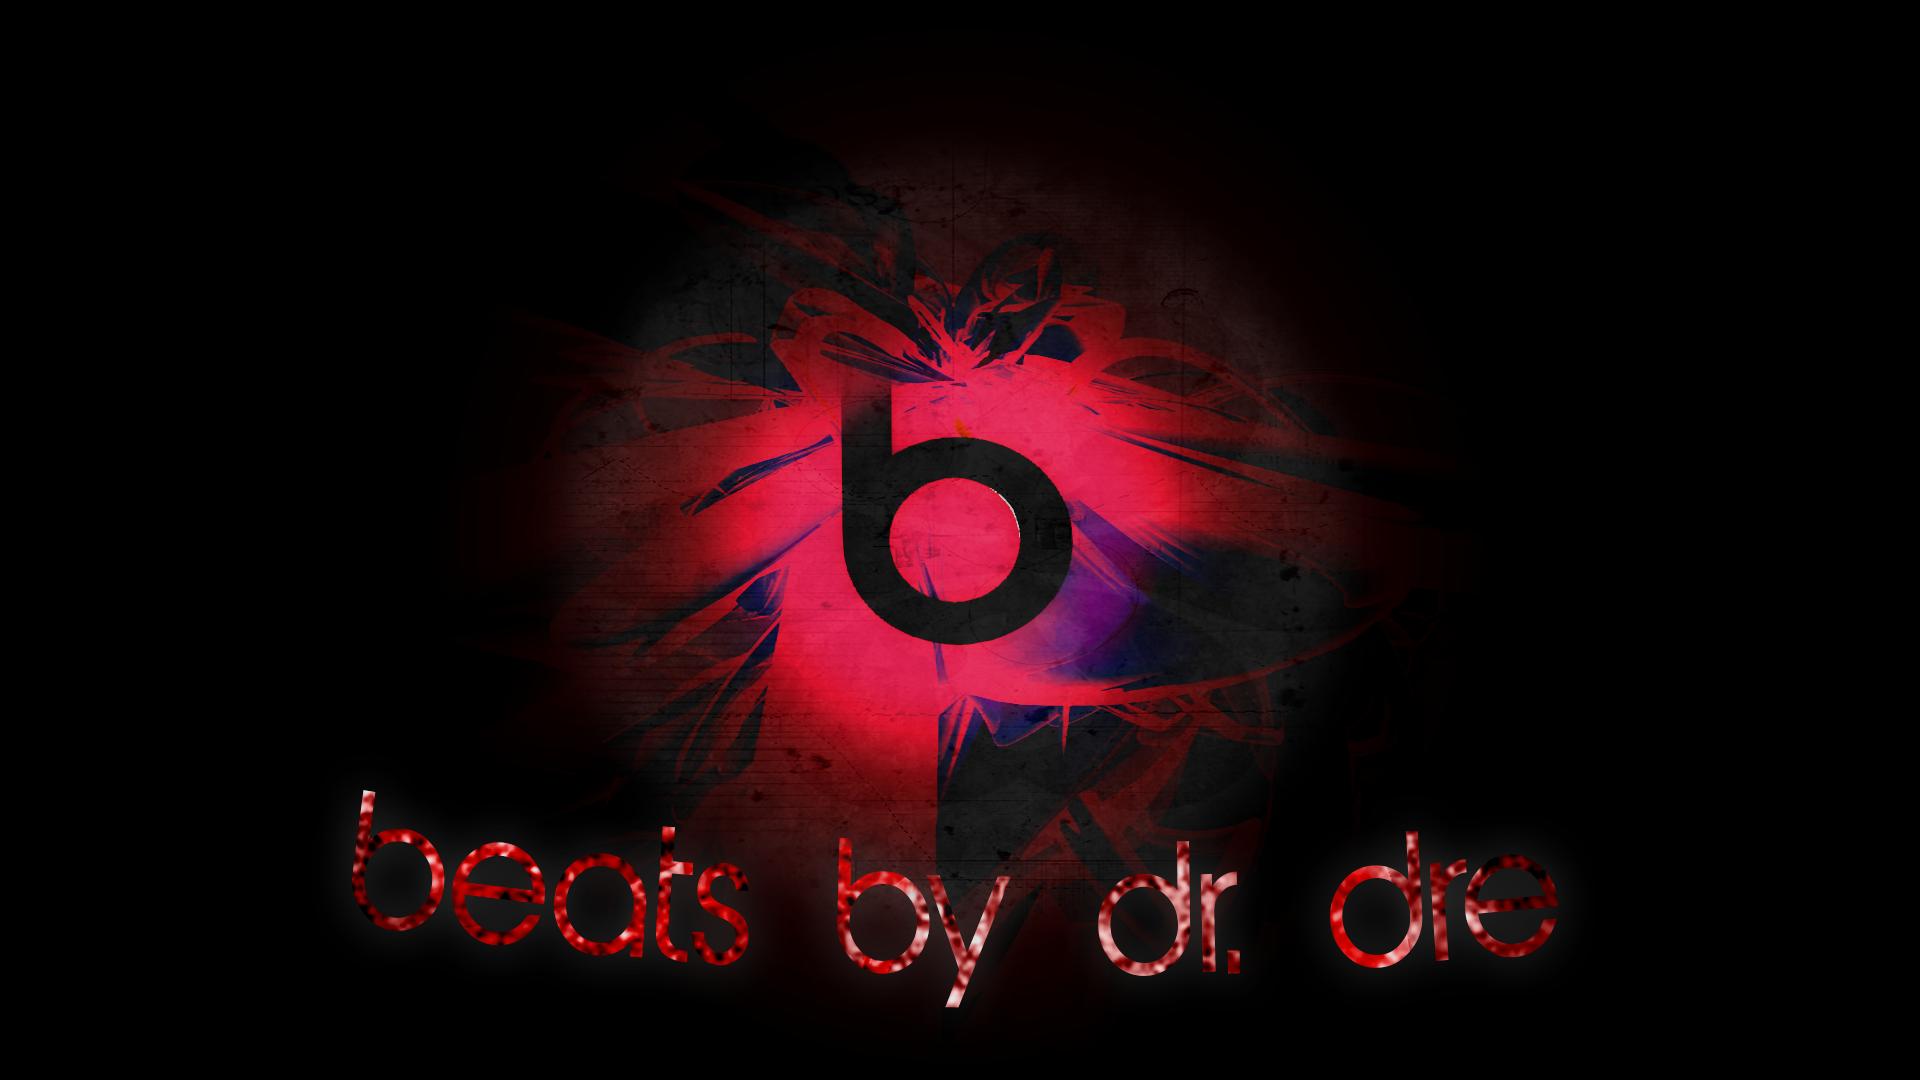 beats by dr dre by echtmawerbistdu on deviantart